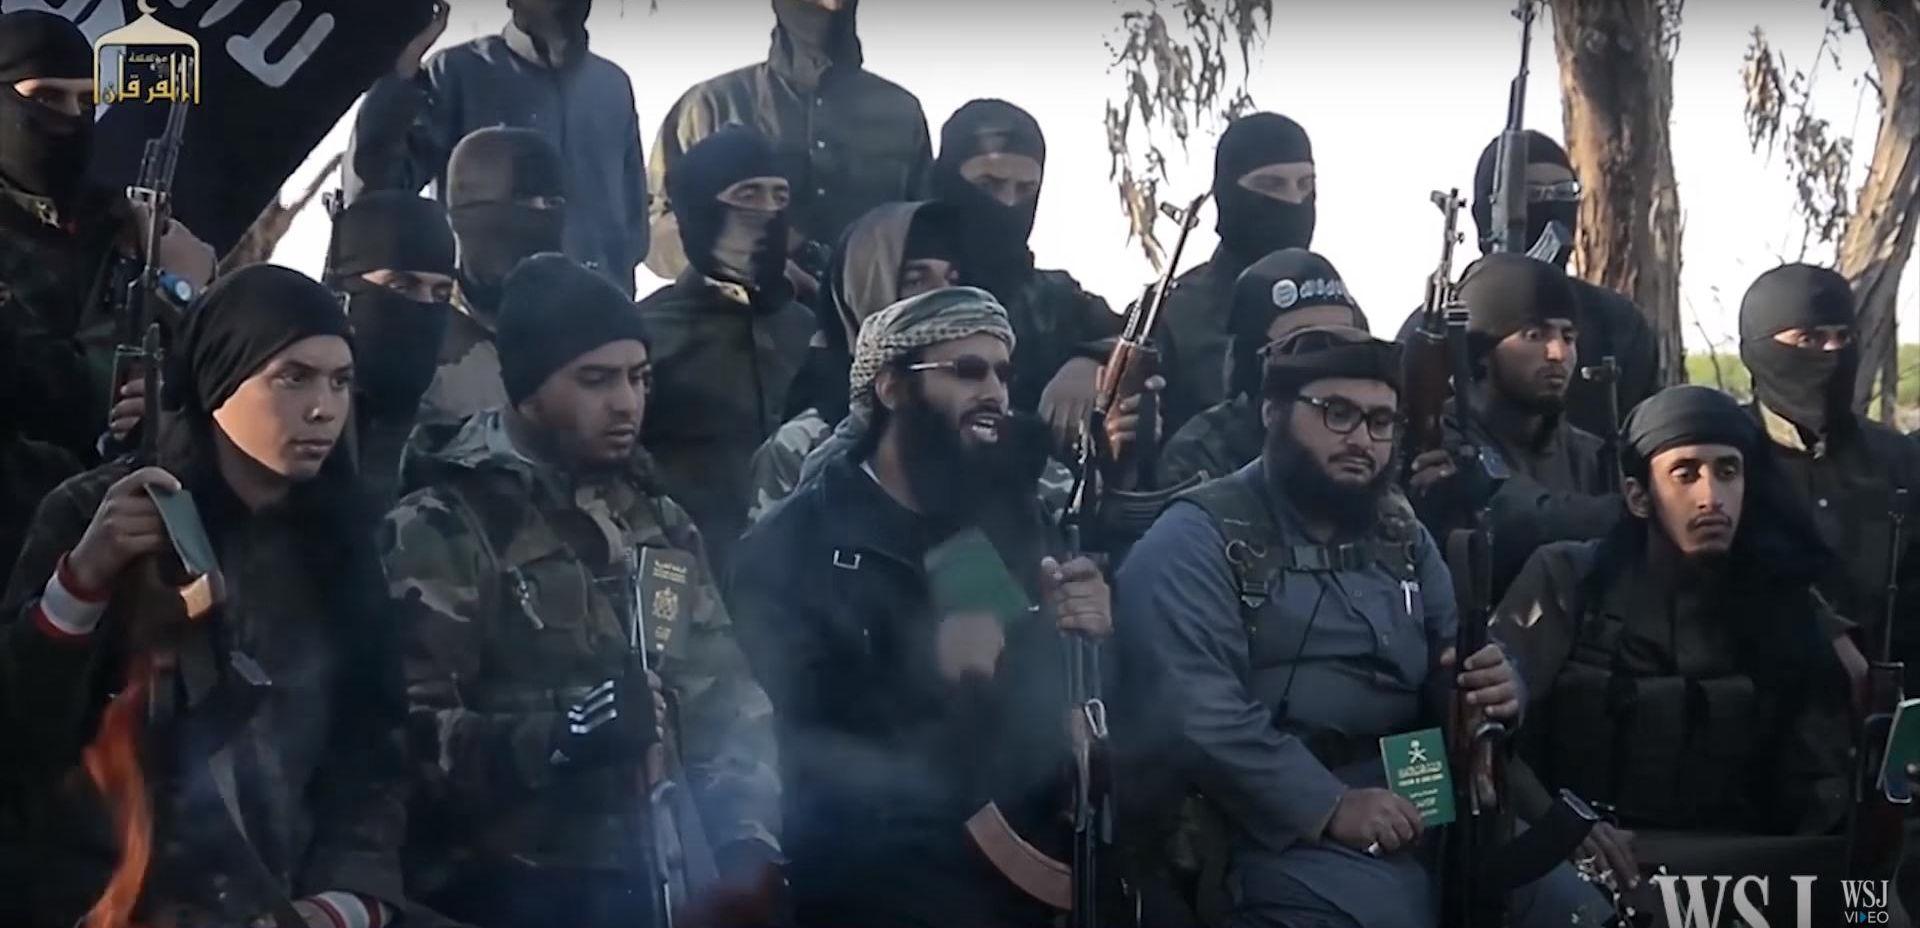 Le Drian: IS napreduje prema unutrašnjosti Libije a cilj je nafta